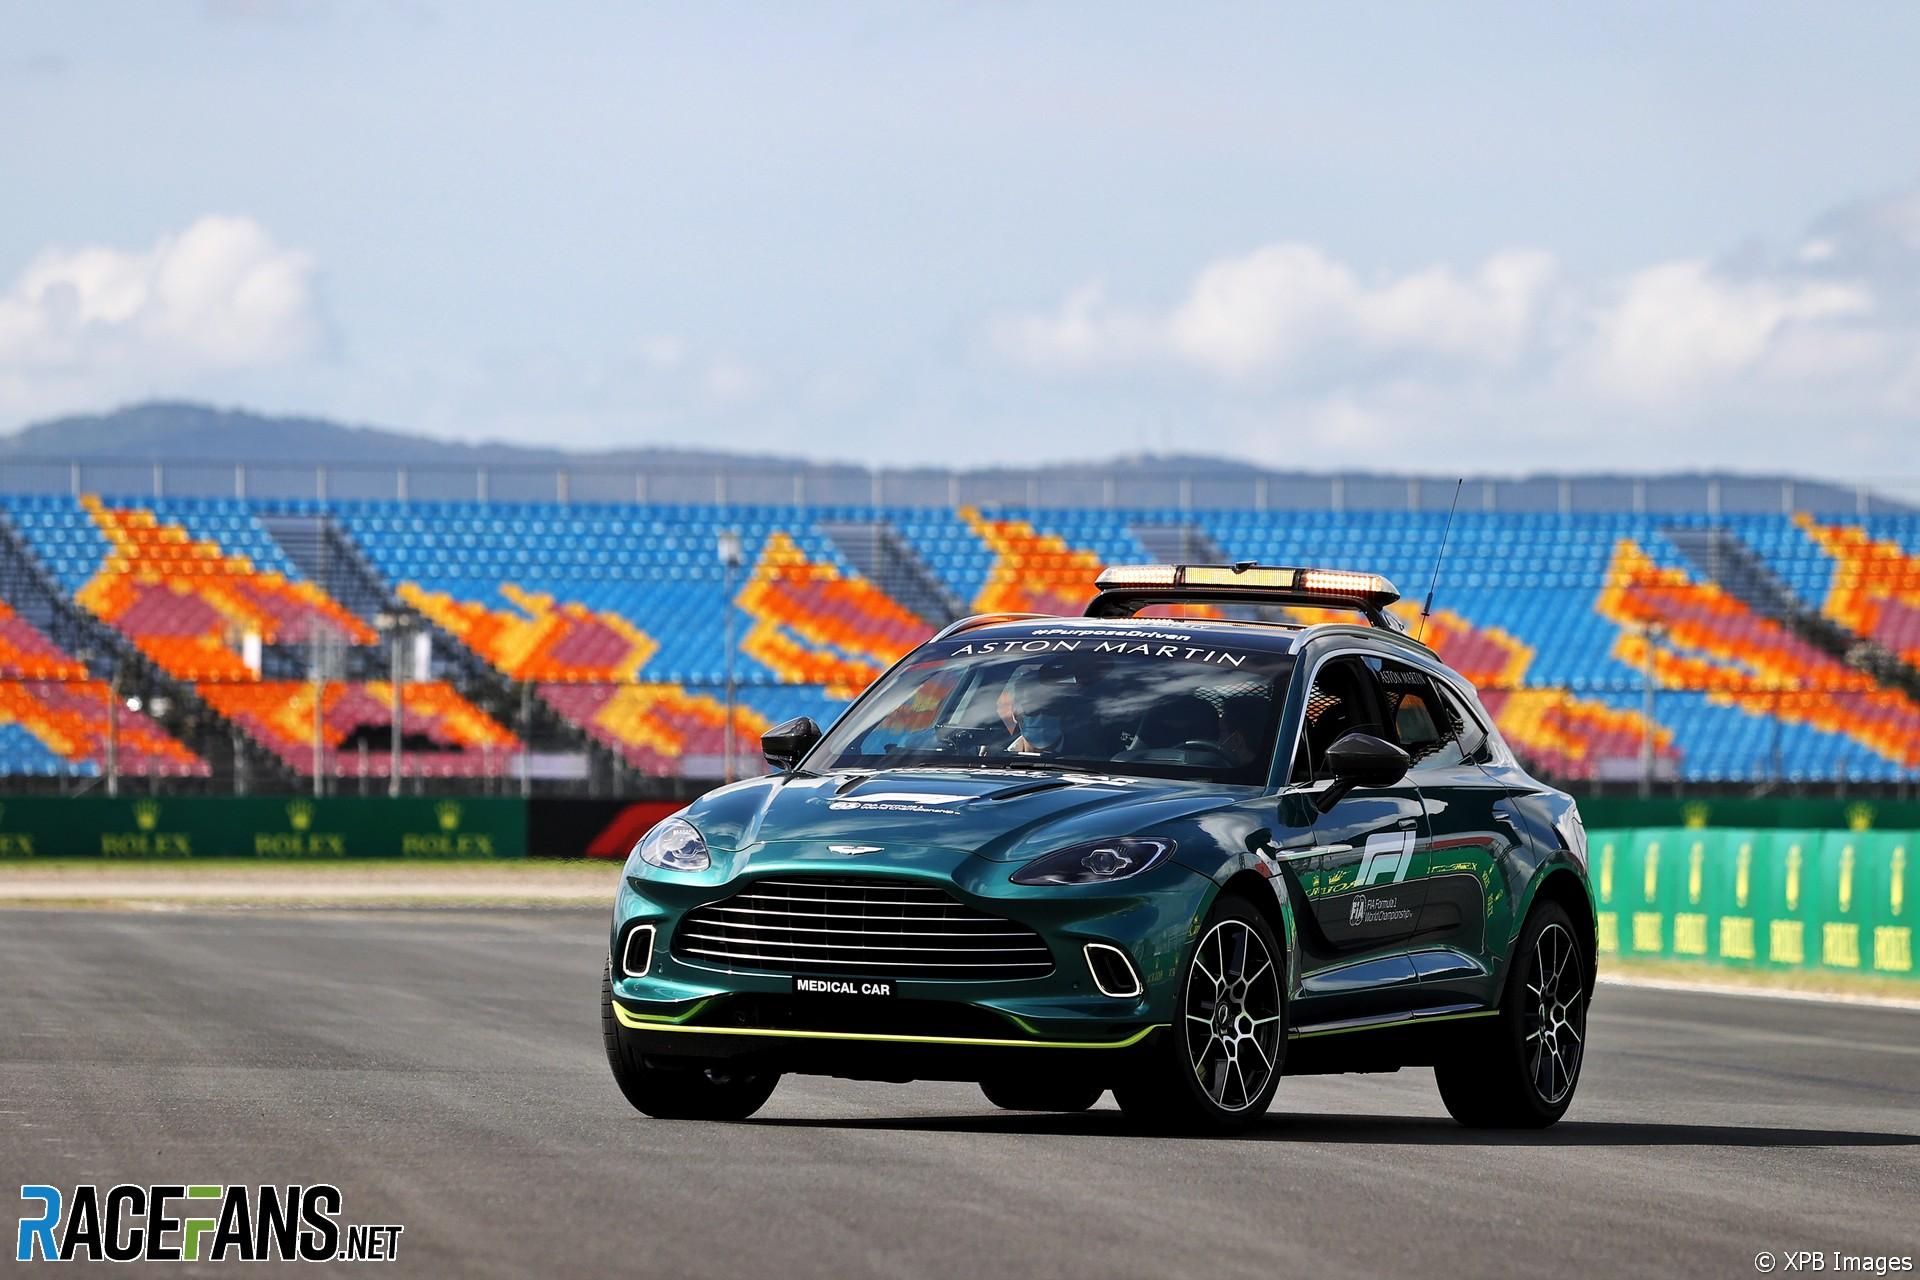 Aston Martin FIA Medical Car